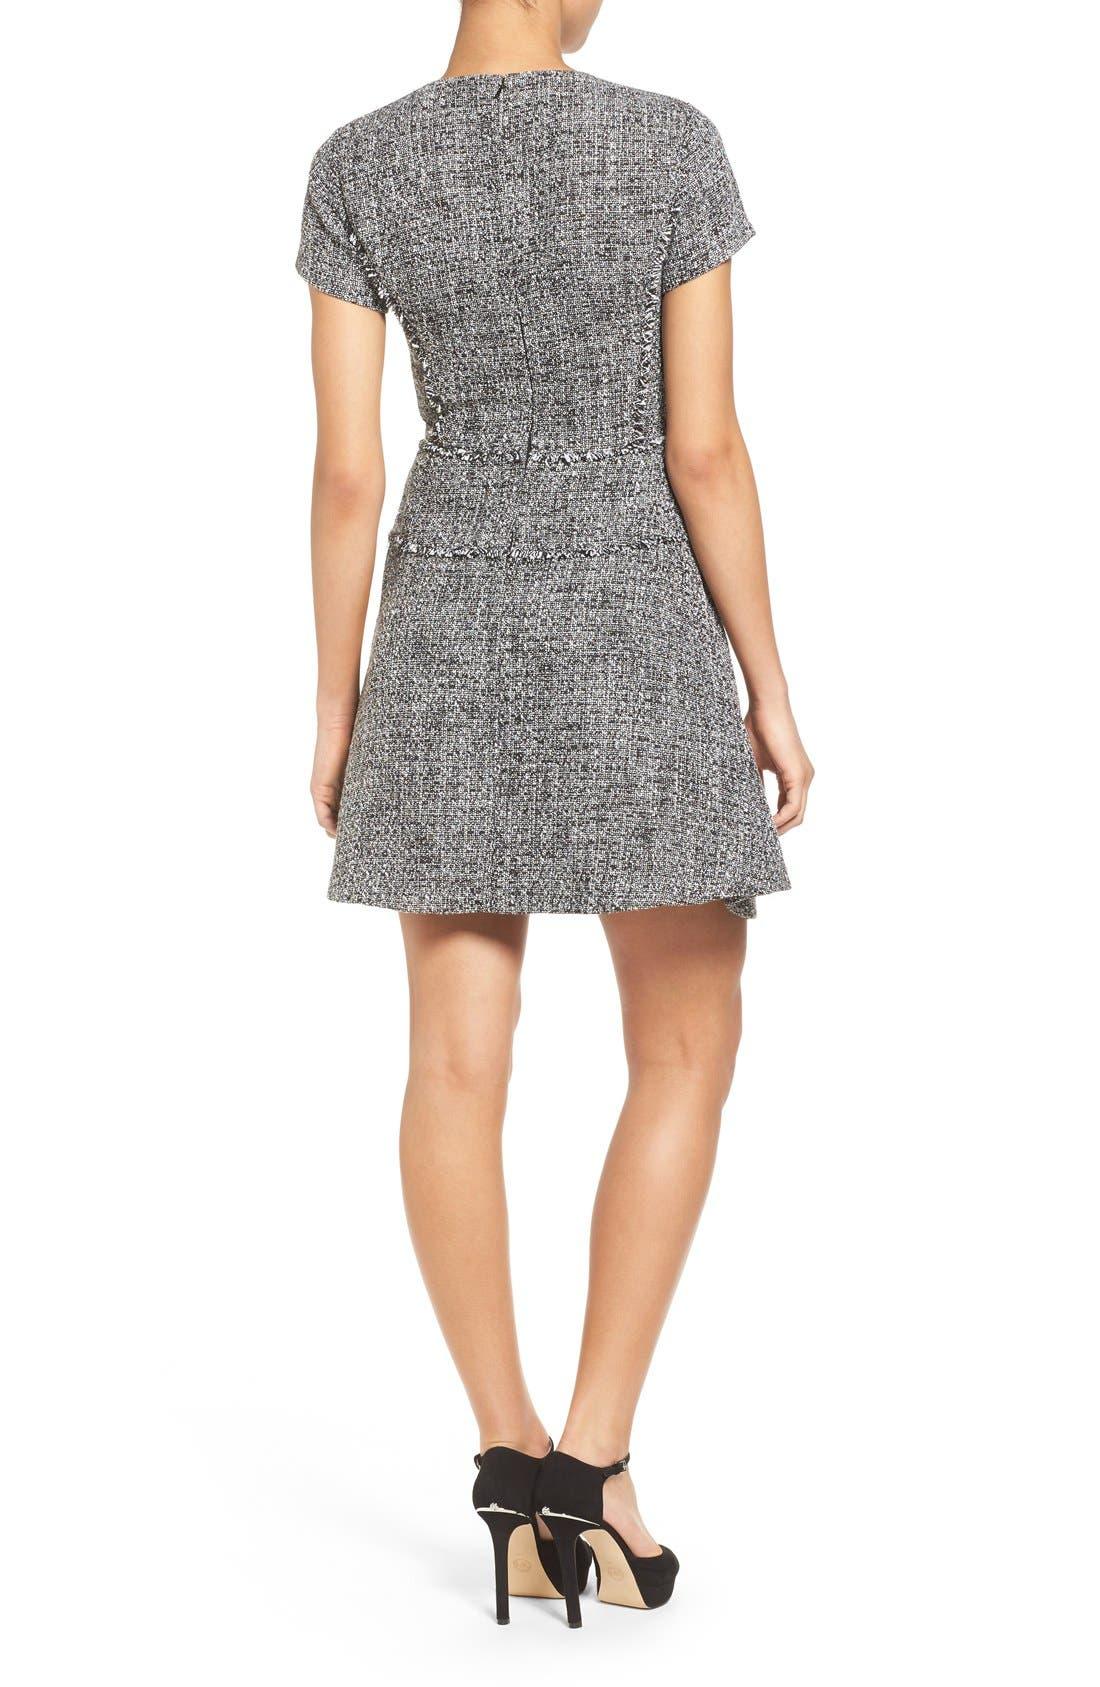 MICHAEL MICHAEL KORS,                             Tweed Fit & Flare Dress,                             Alternate thumbnail 5, color,                             001